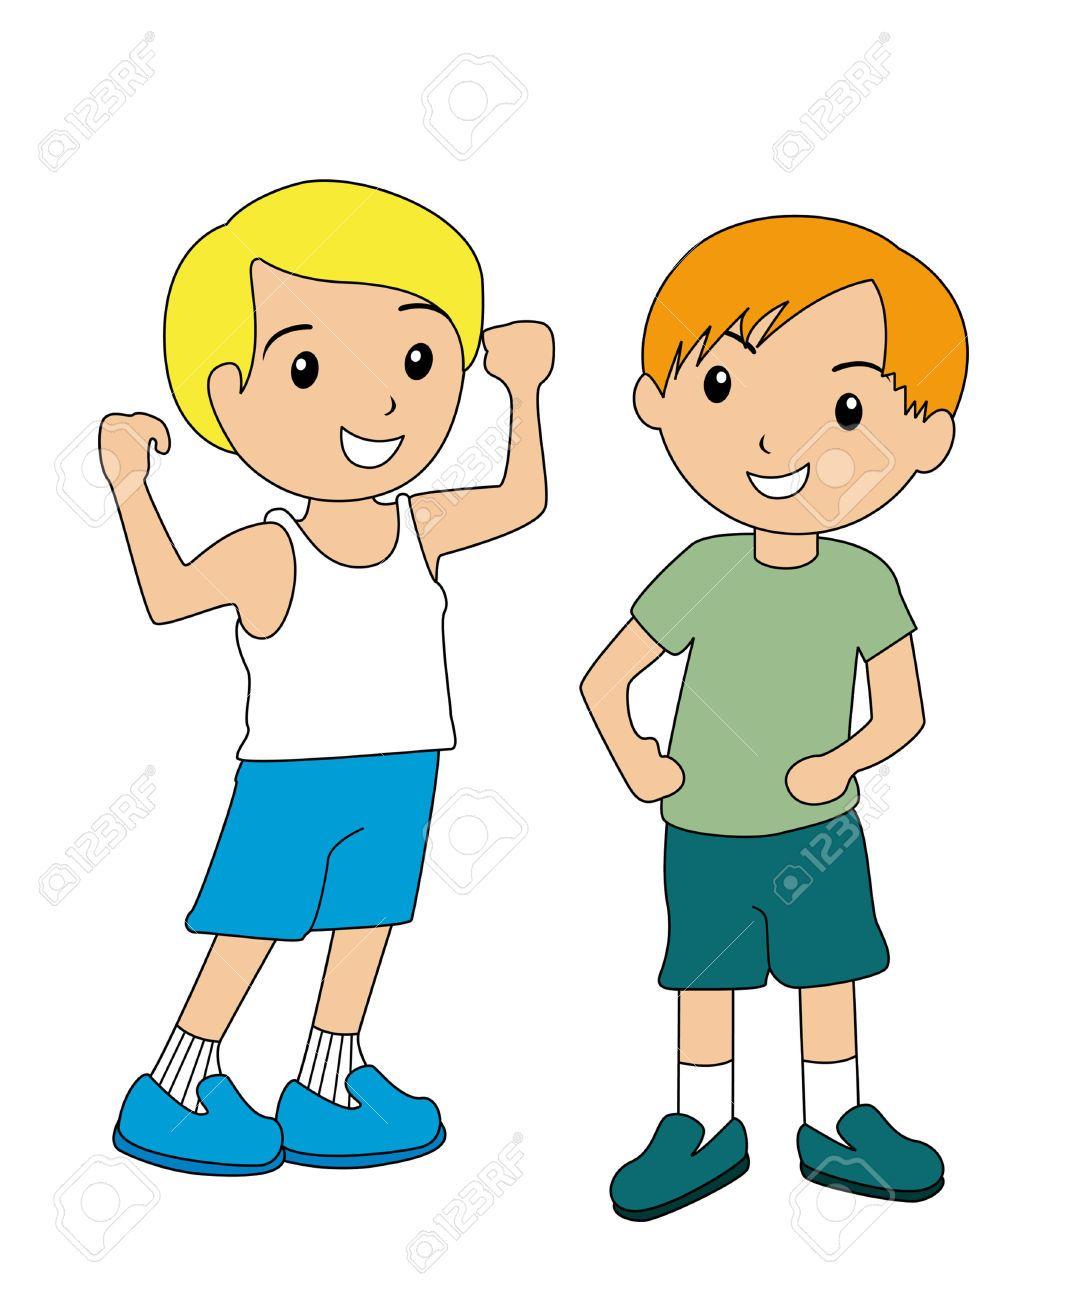 strong child pictures clip art google search tijelo pinterest rh pinterest com clipart children praying clipart children praying